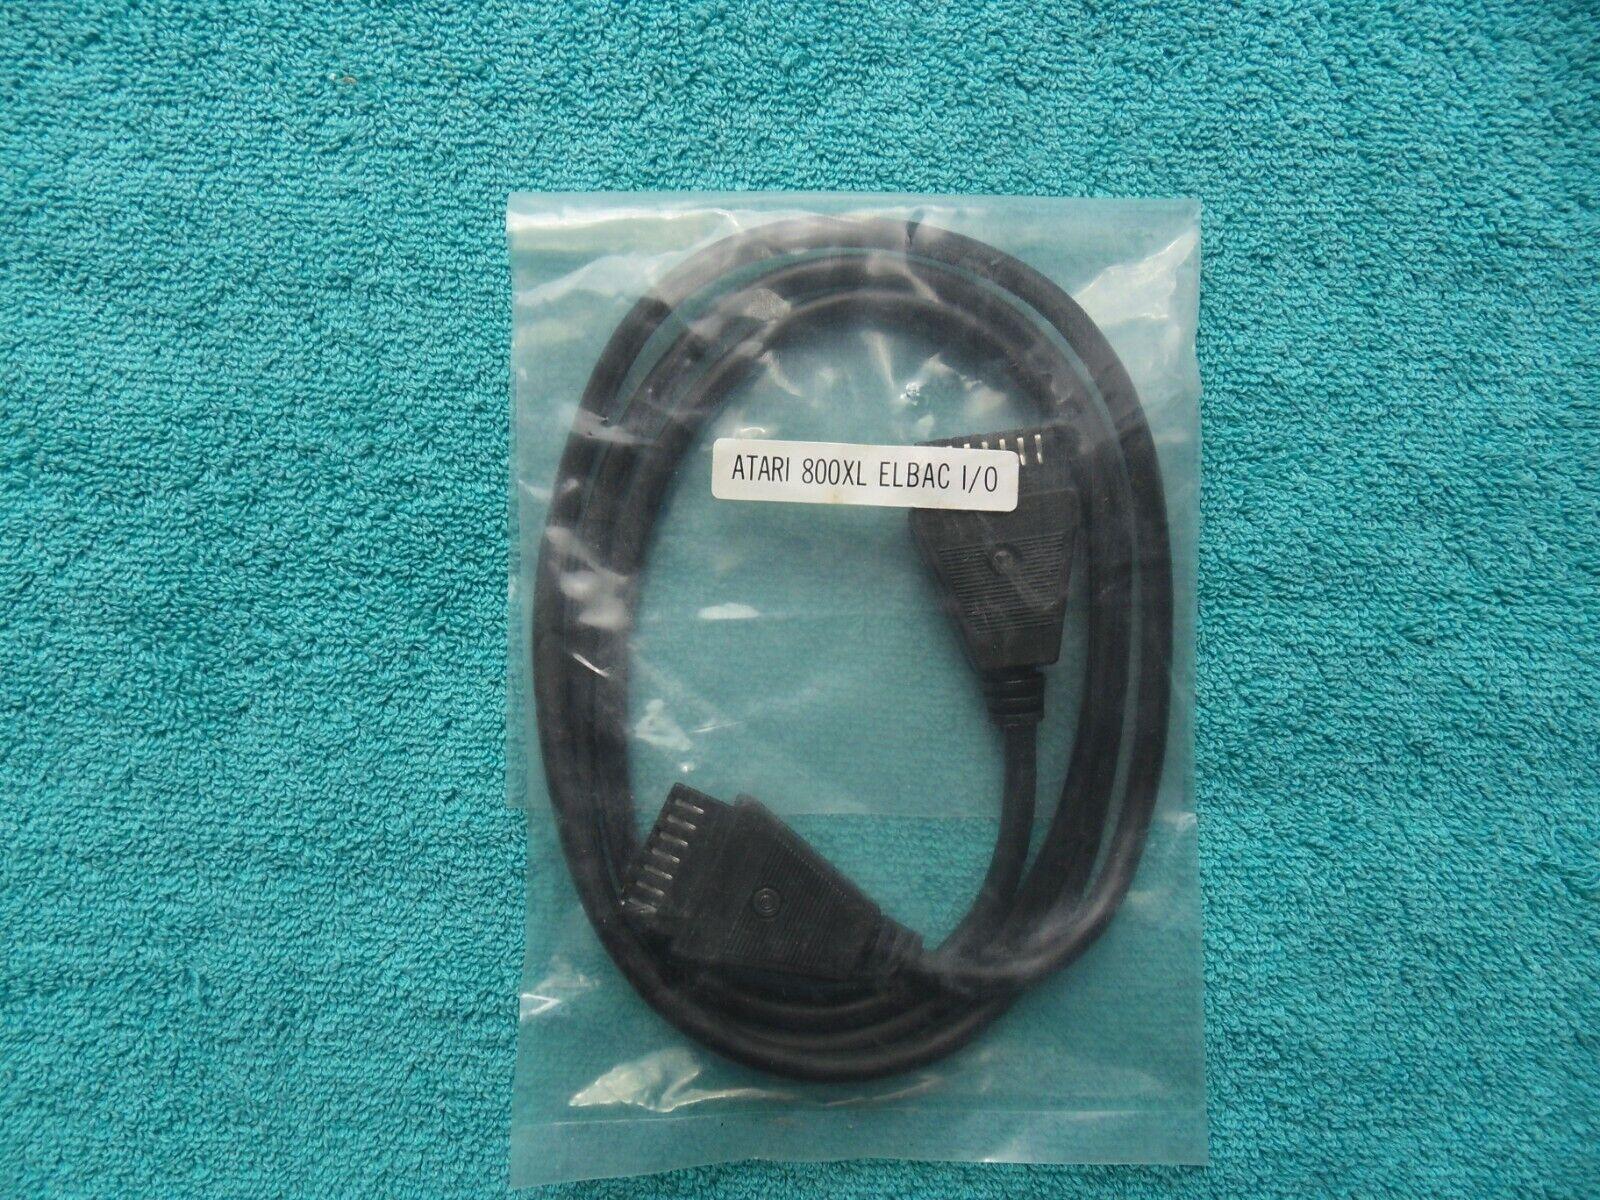 * new & sealed * SIO SERIAL PORT CONNECTOR CABLE LEAD - atari 800XL - elbac I/O